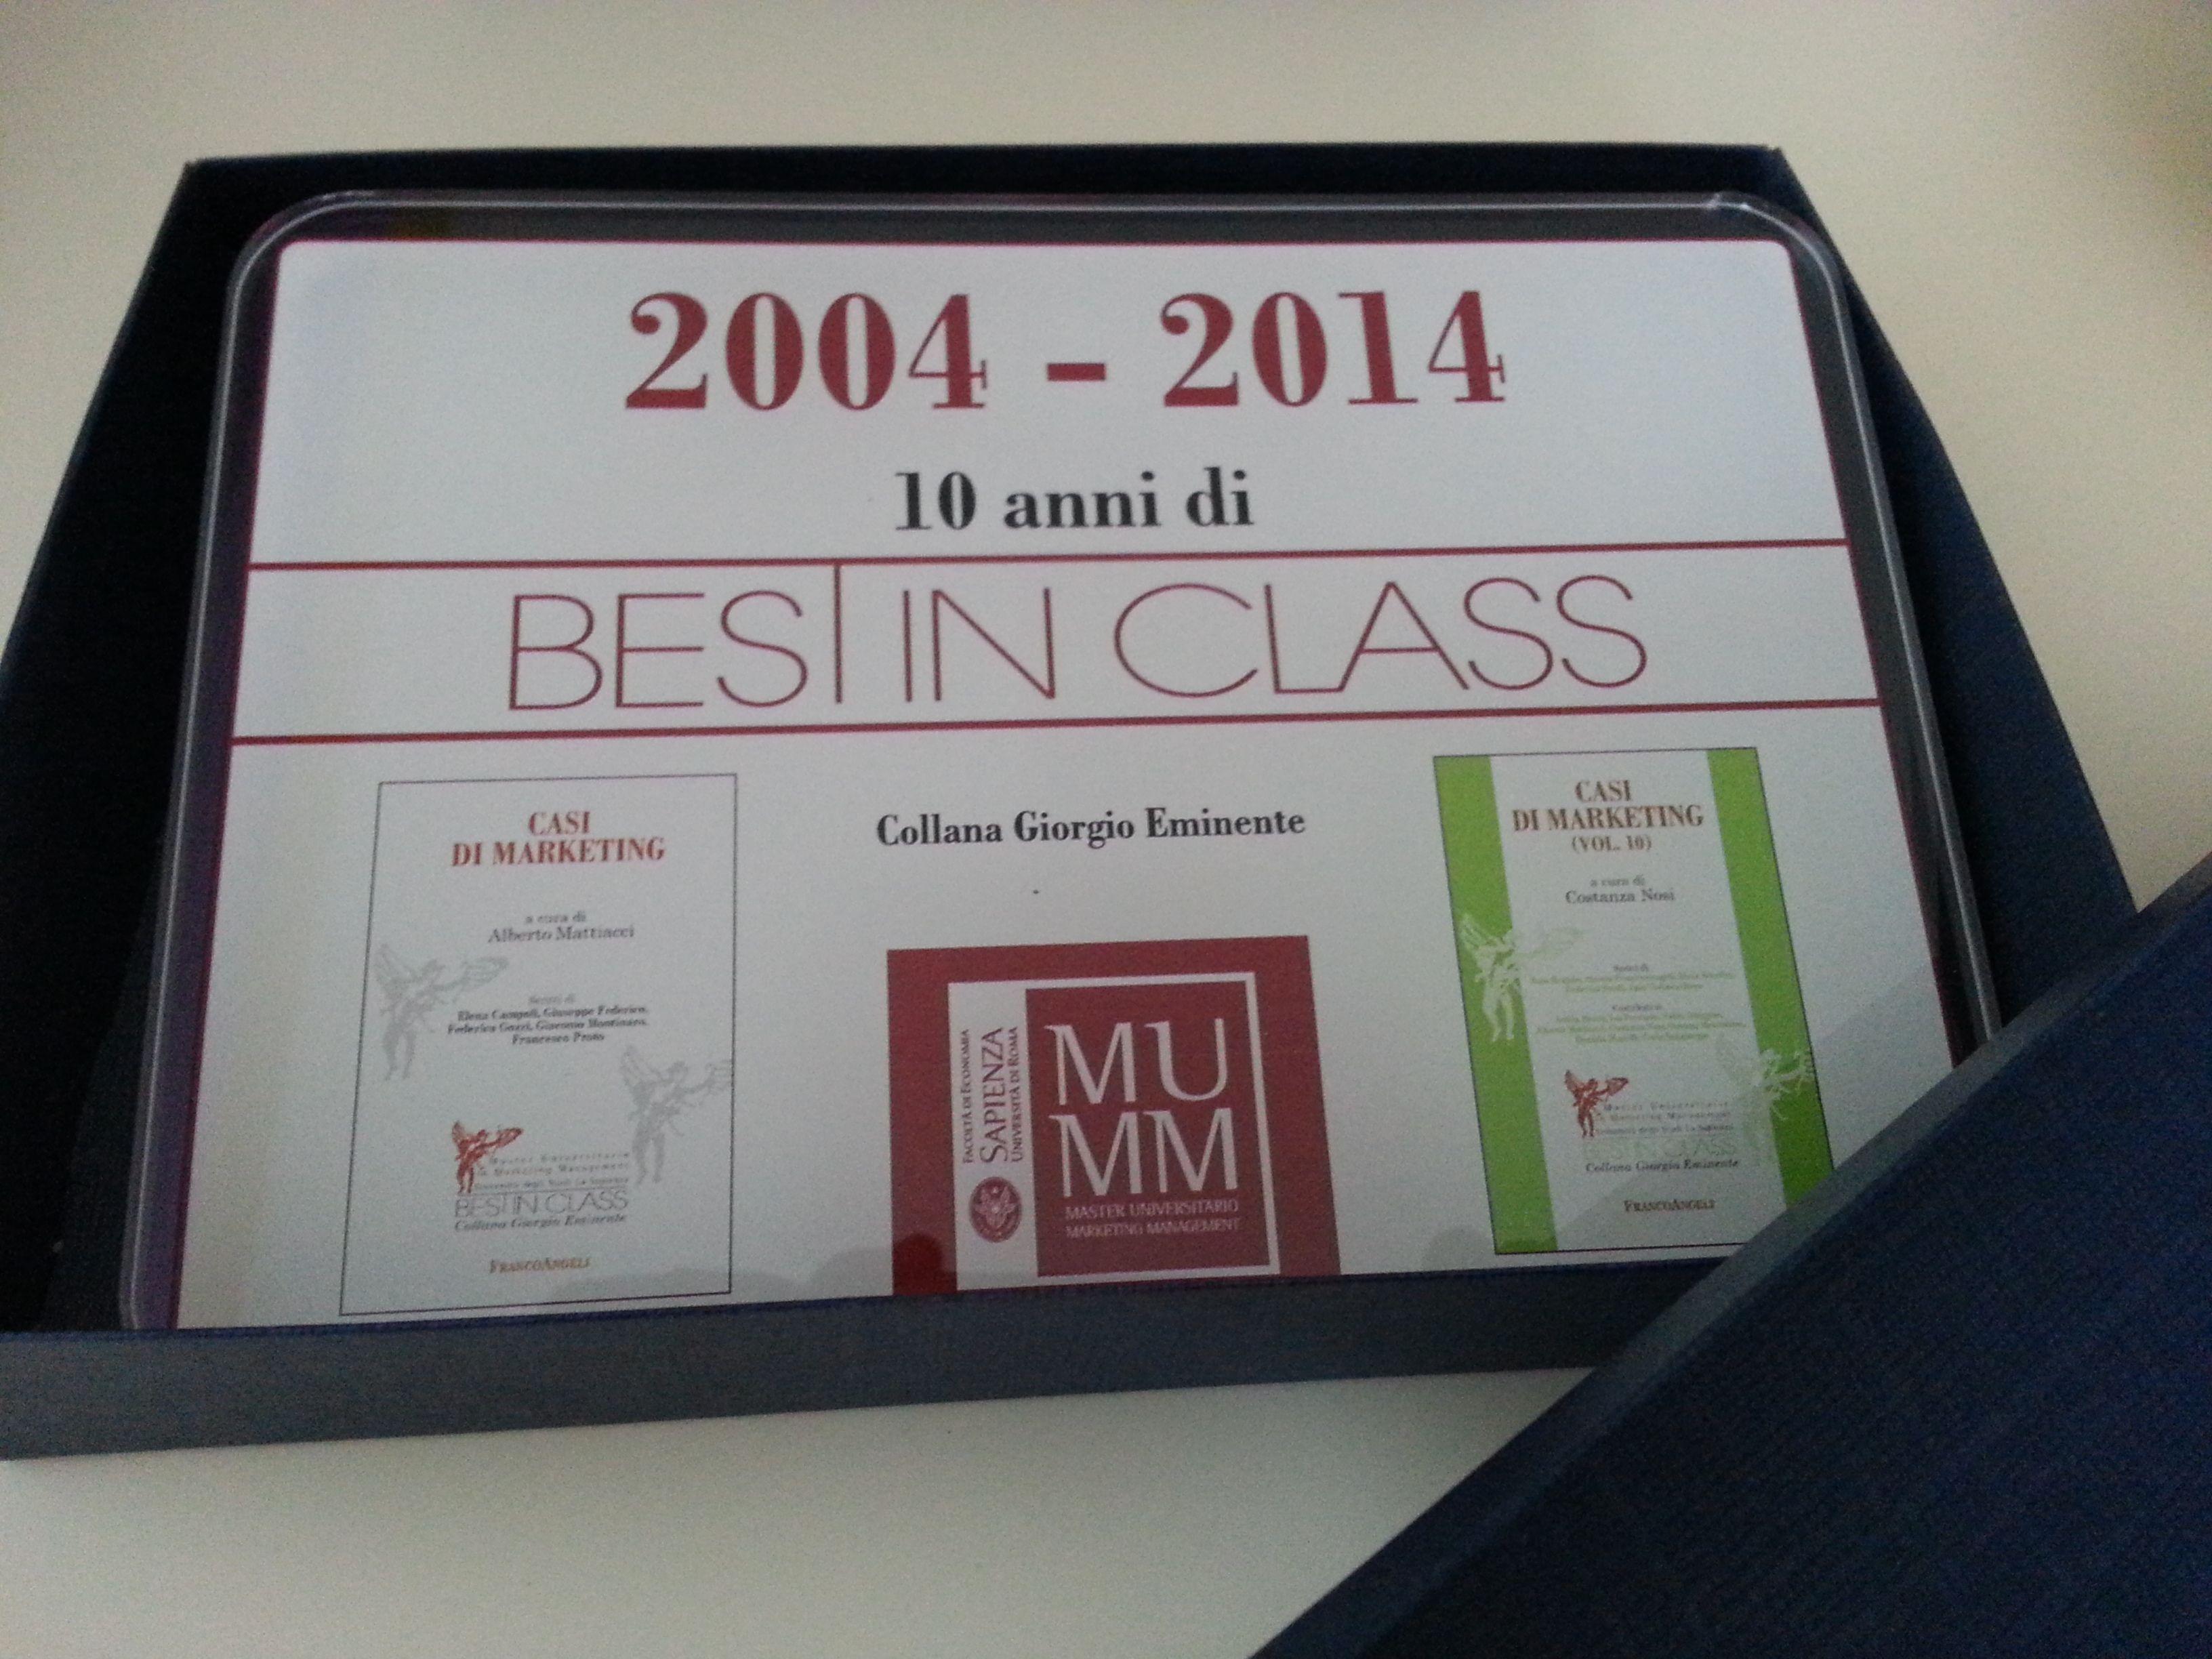 Best In Class -2004/2014